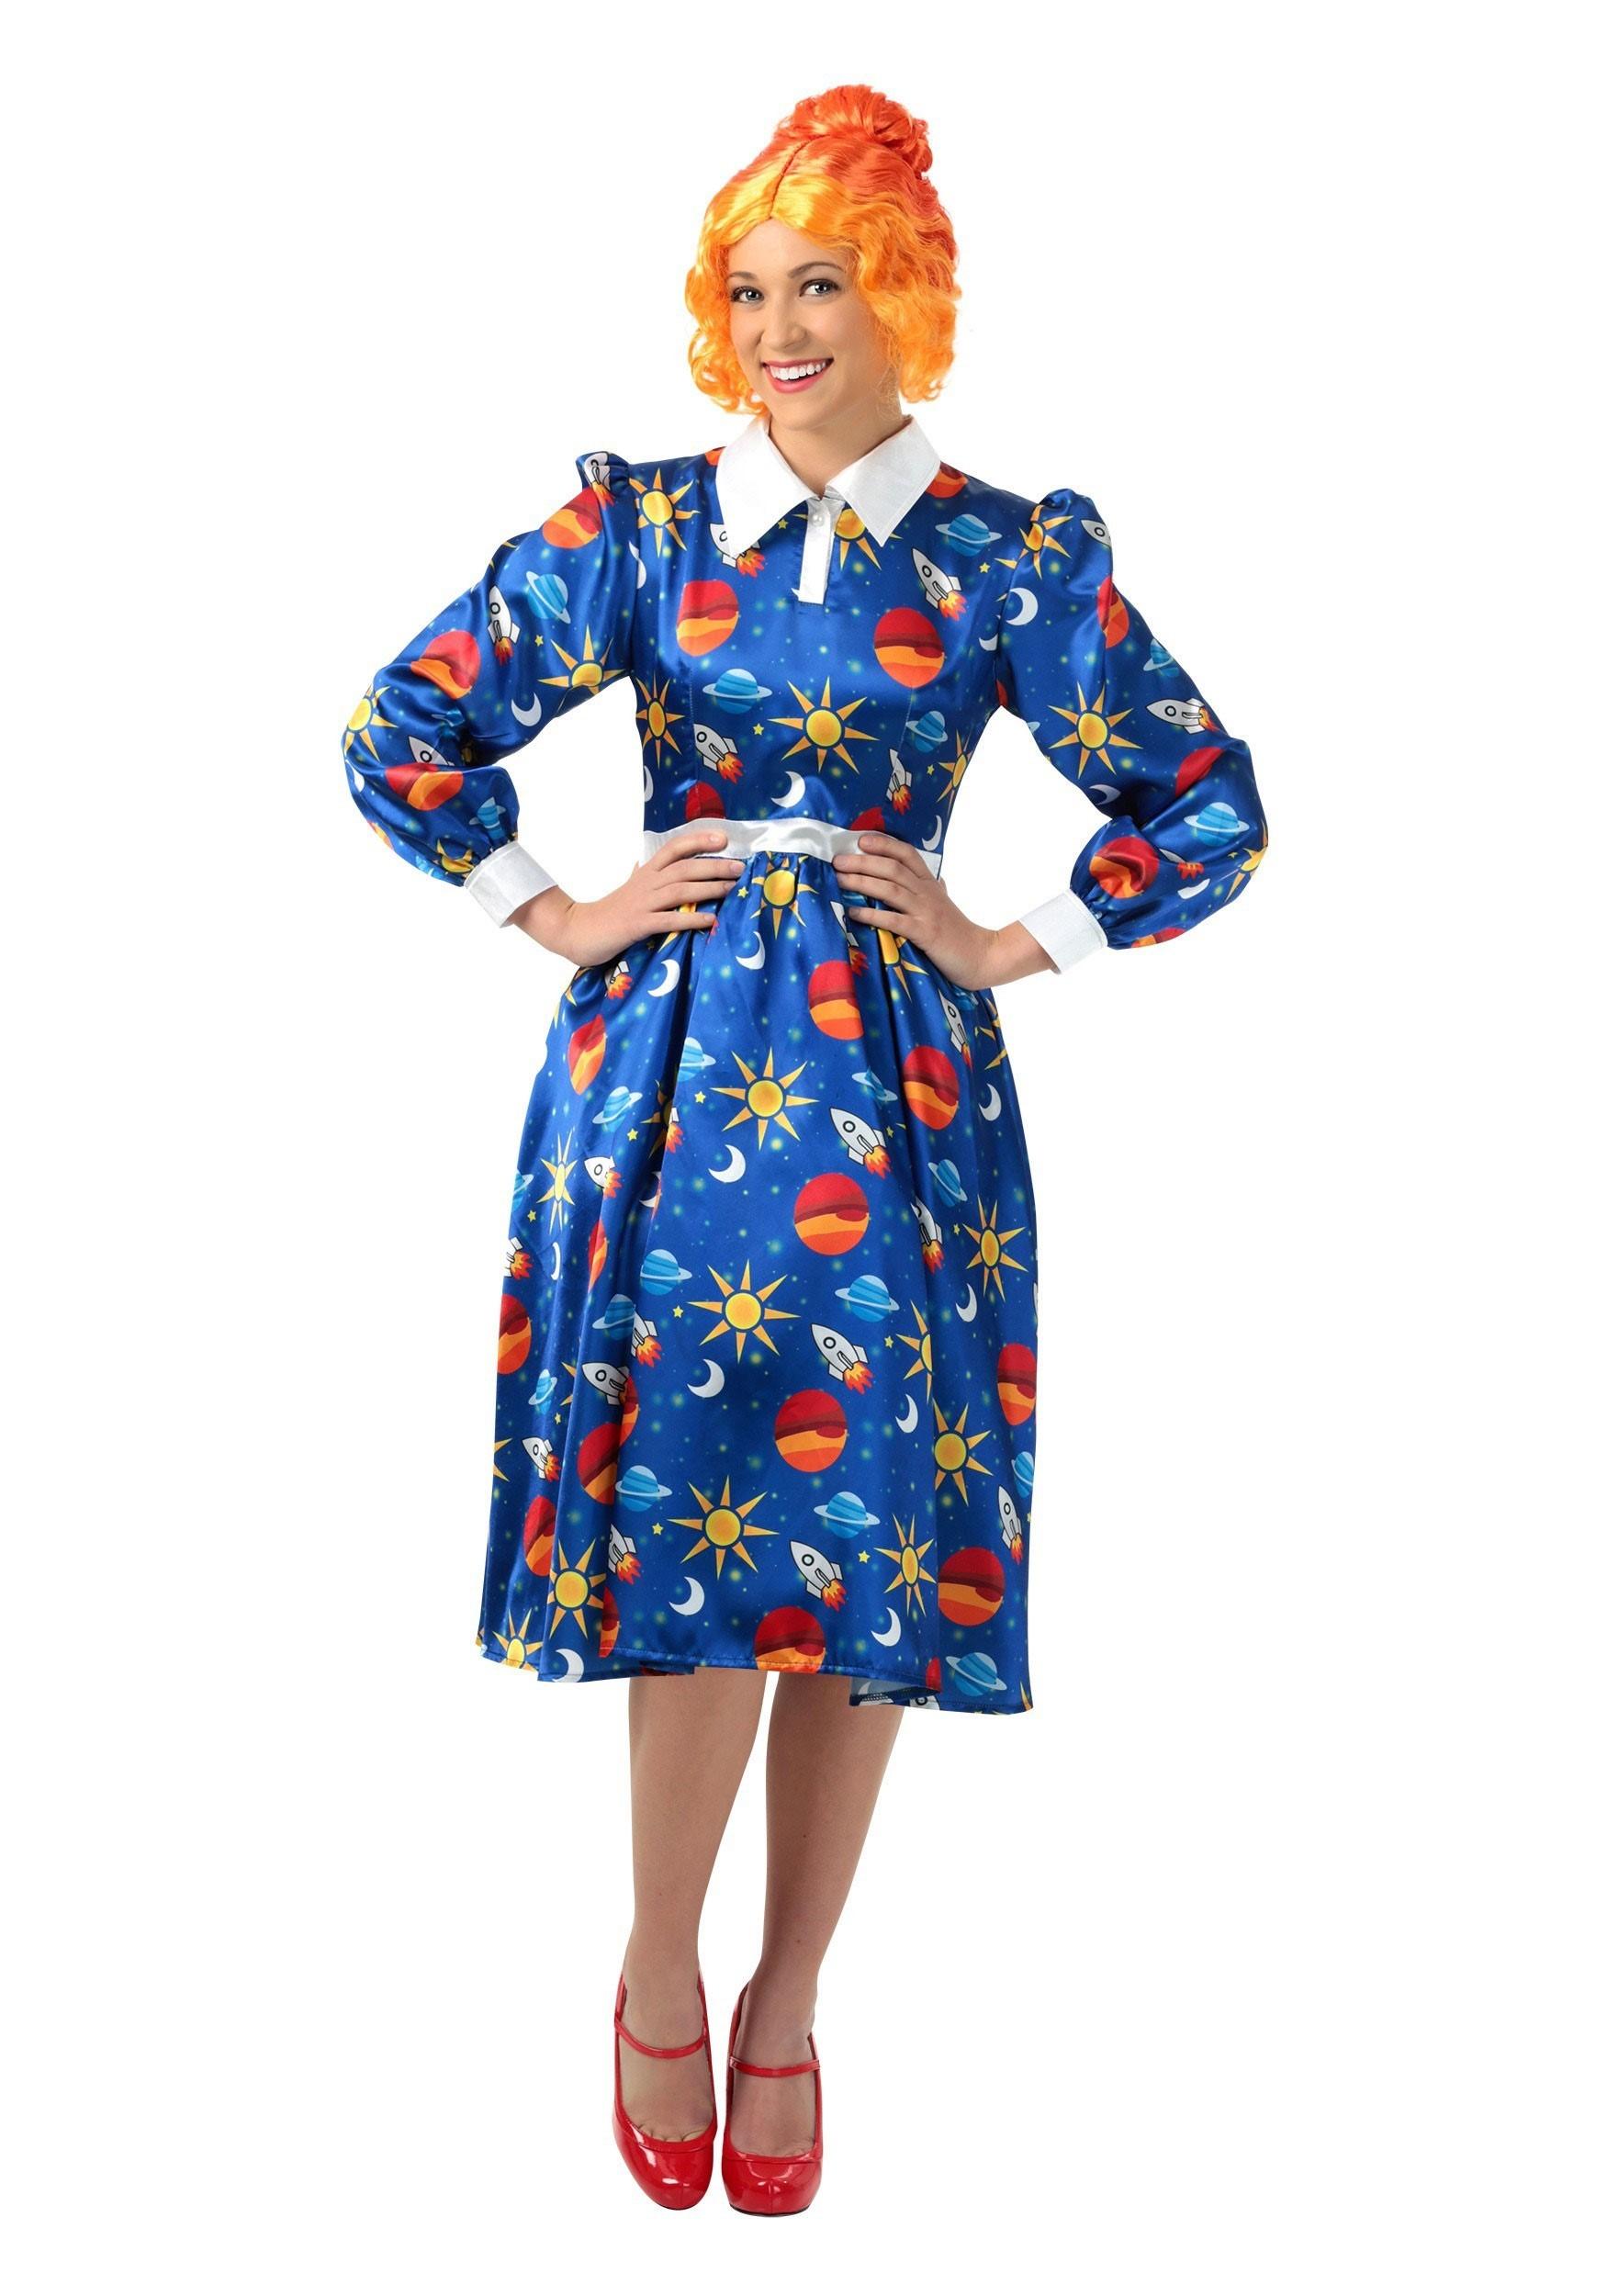 The Magic School Bus Miss Frizzle Plus Size Costume for Women